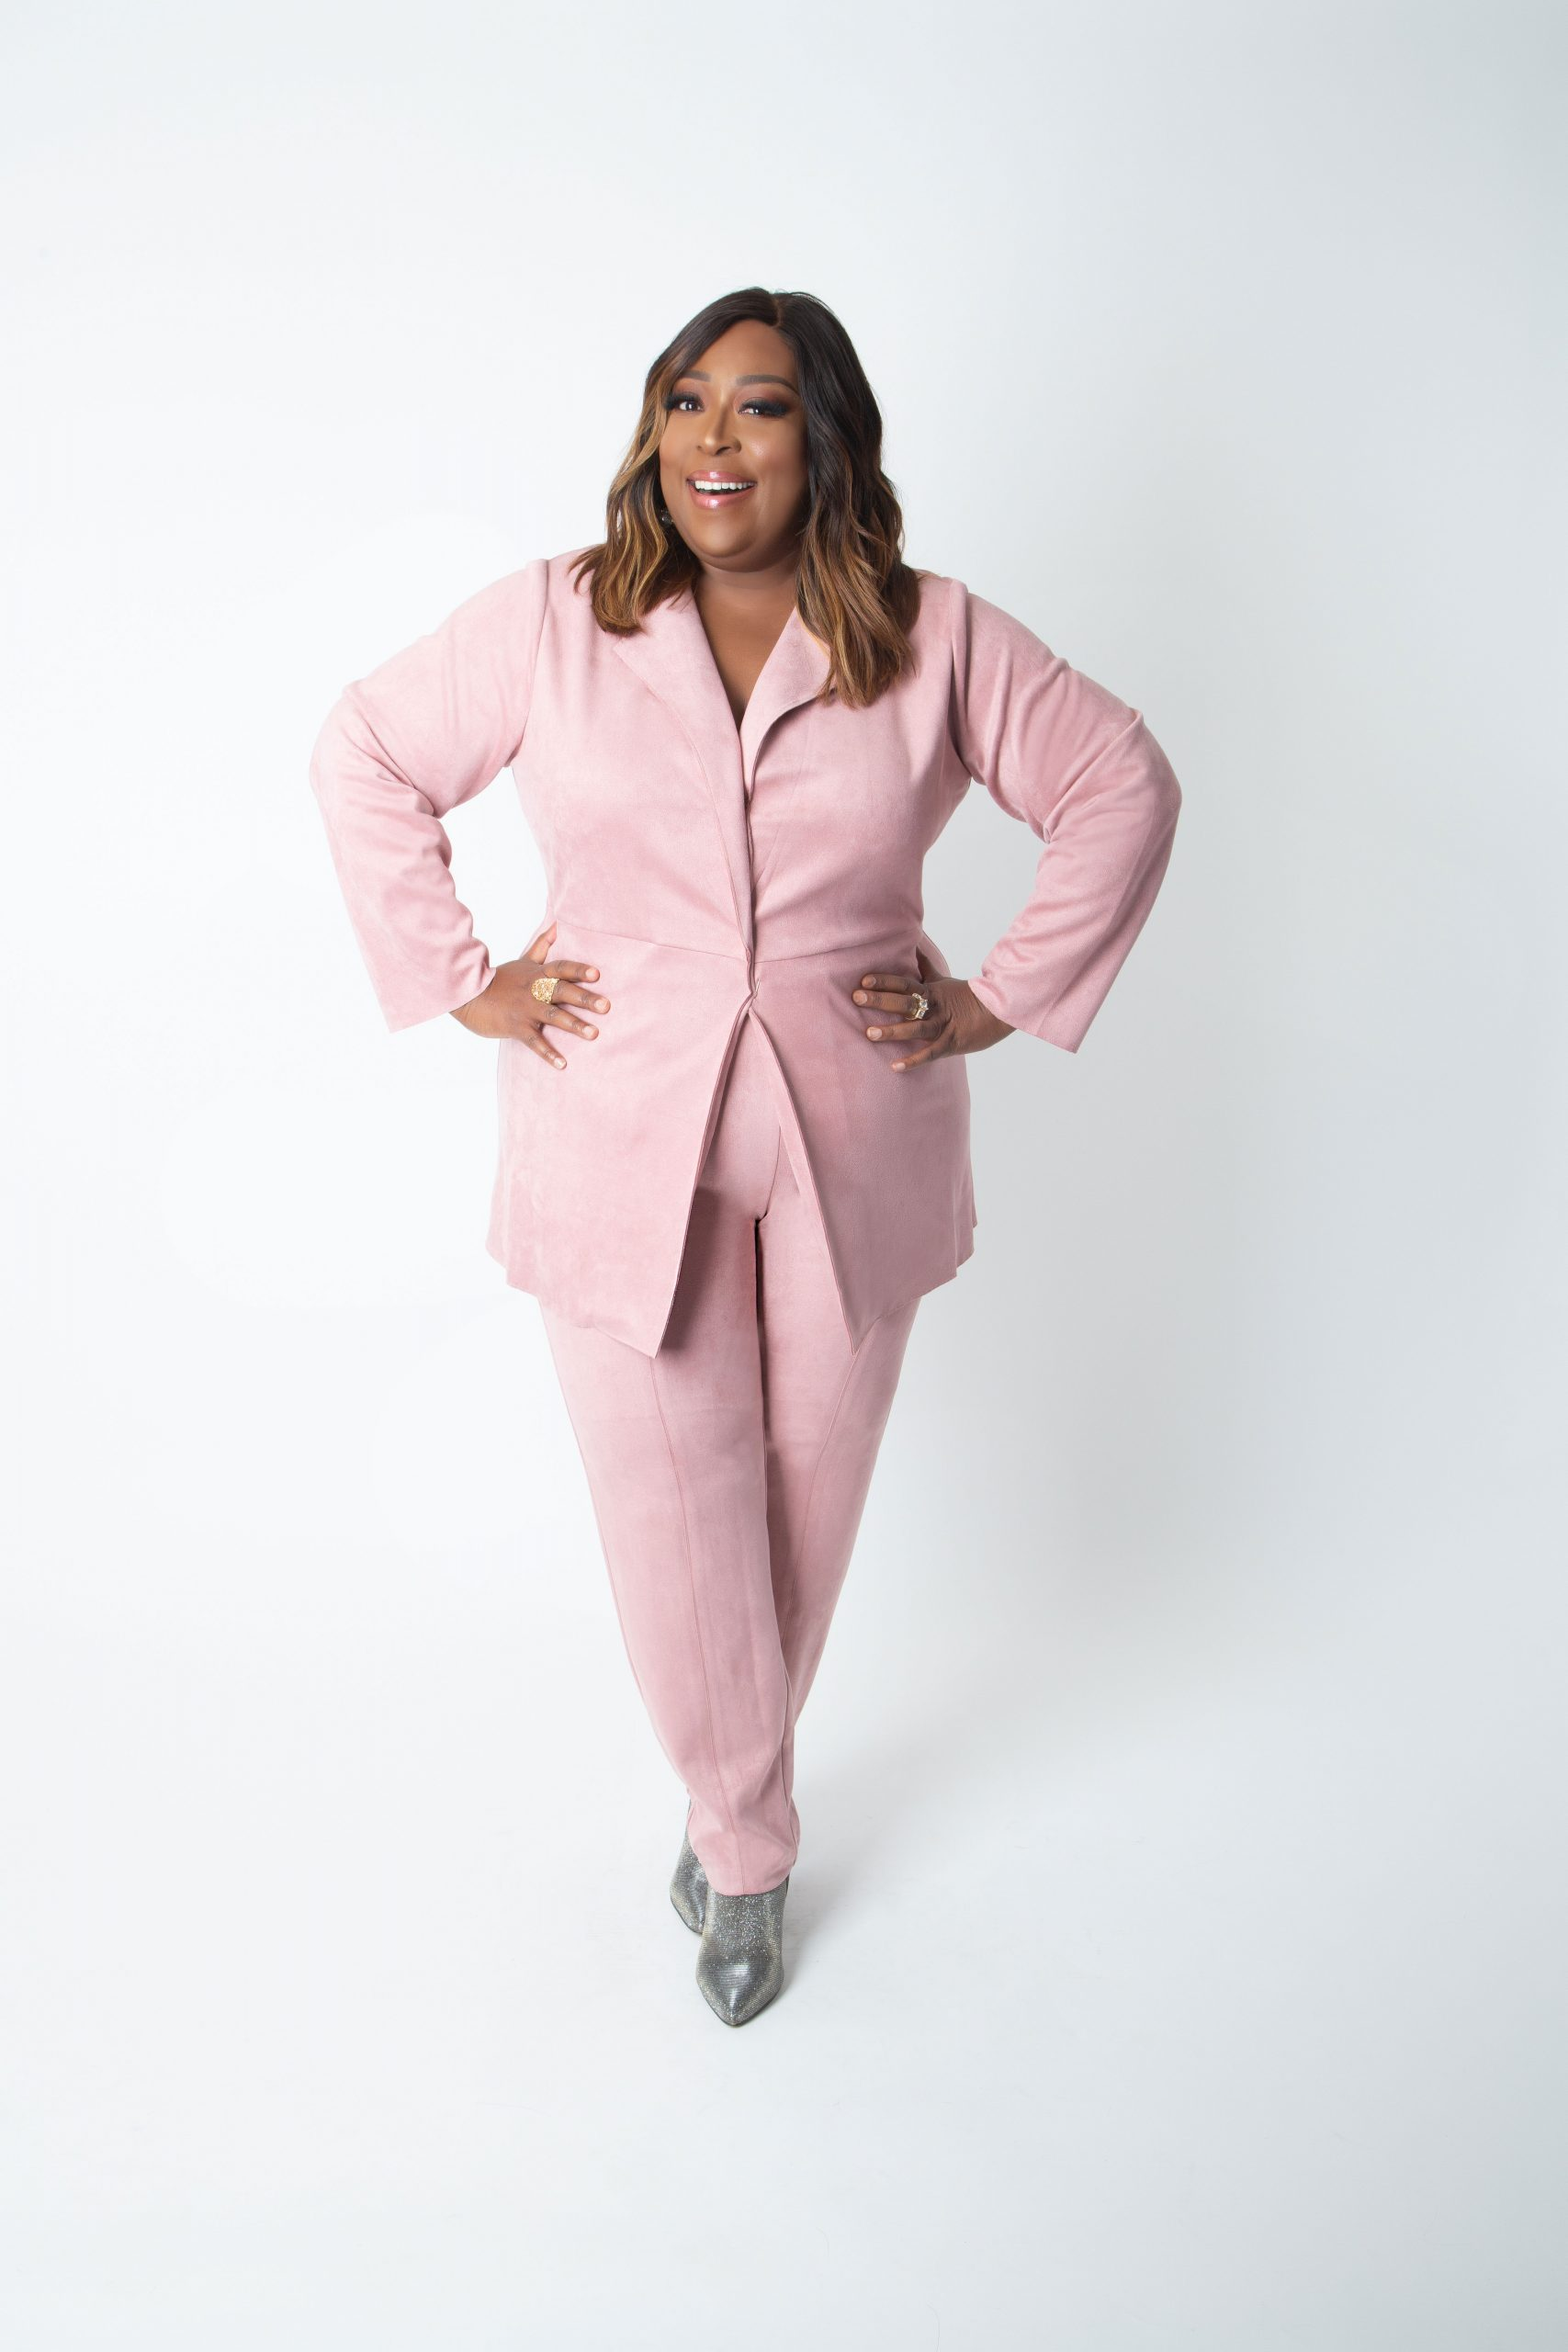 Pink Suede Plus Size Suit - Loni Love